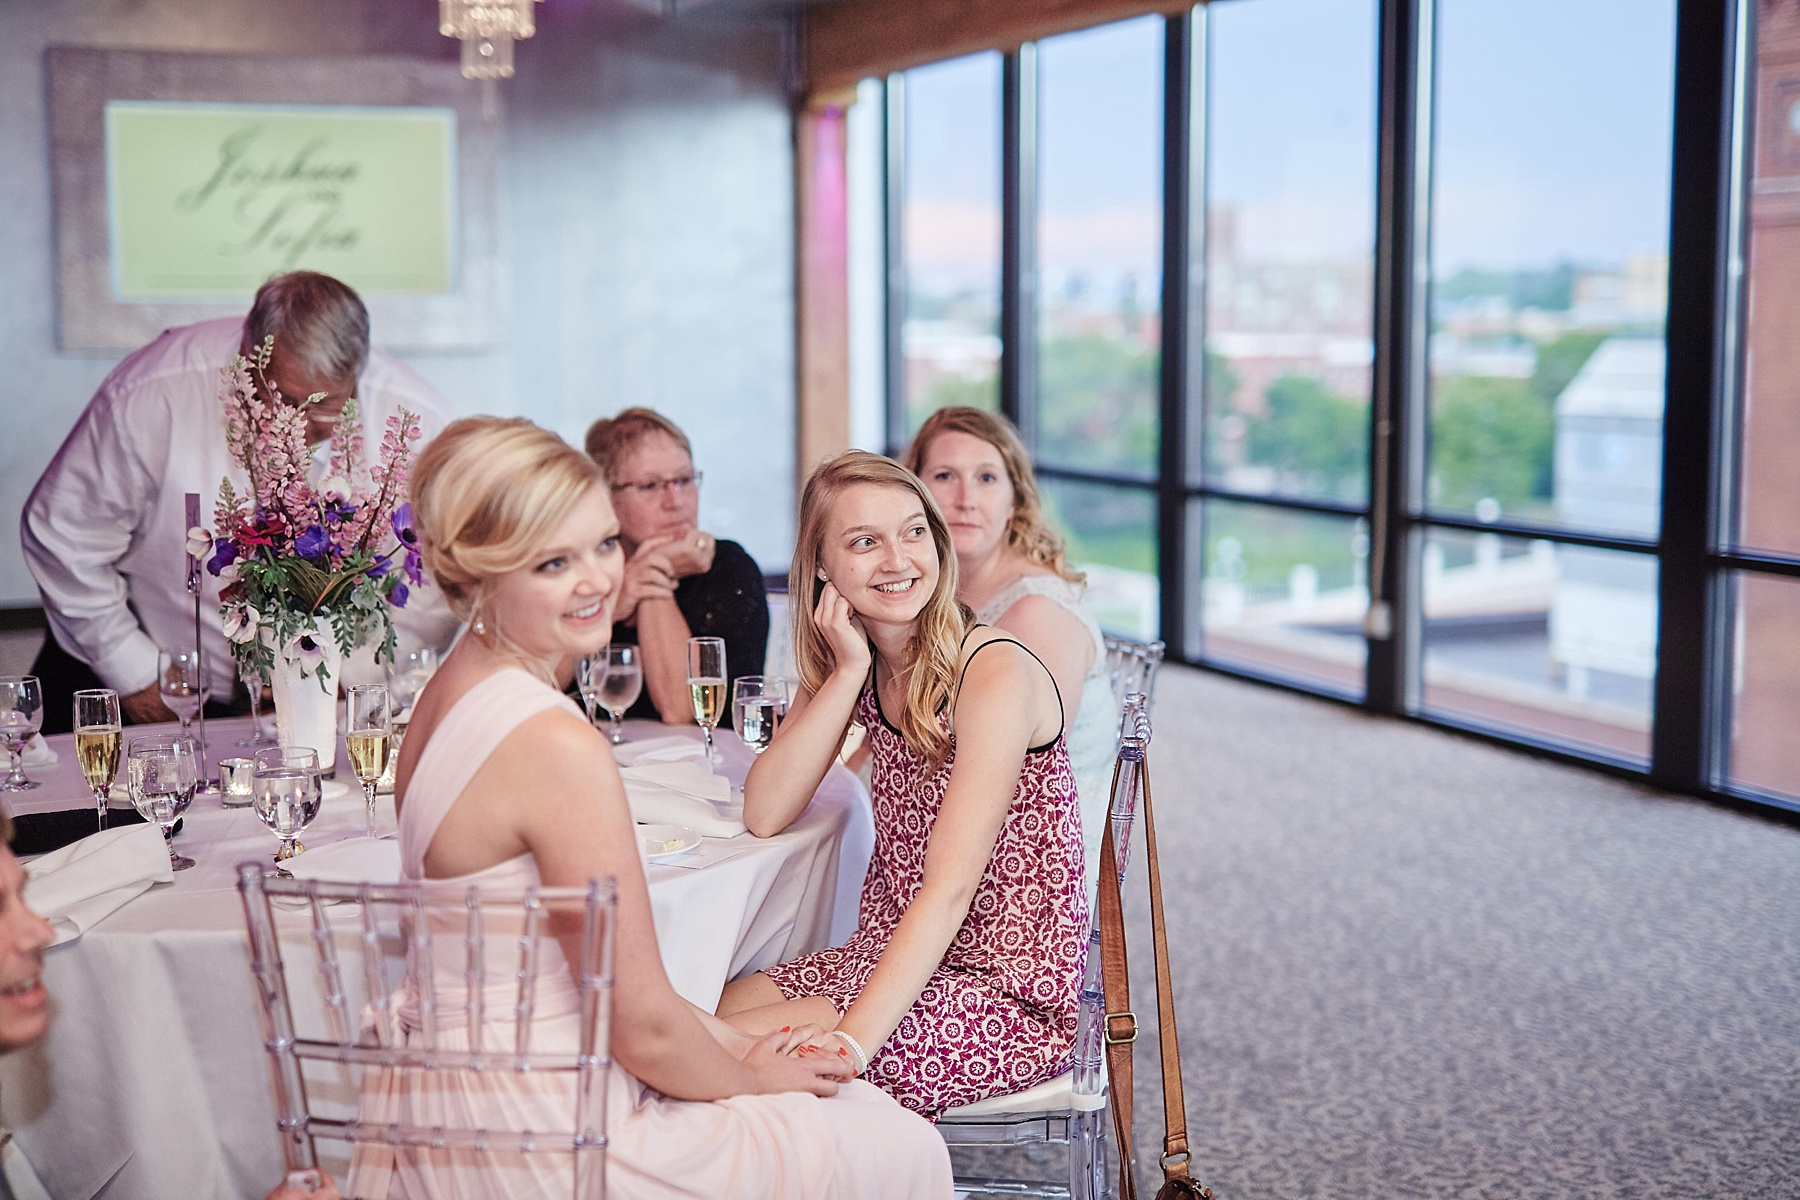 ABULAE-Wedding-Saint-paul-MN-Josh-Sofia-Wedding-Mears-Park_0827.jpg